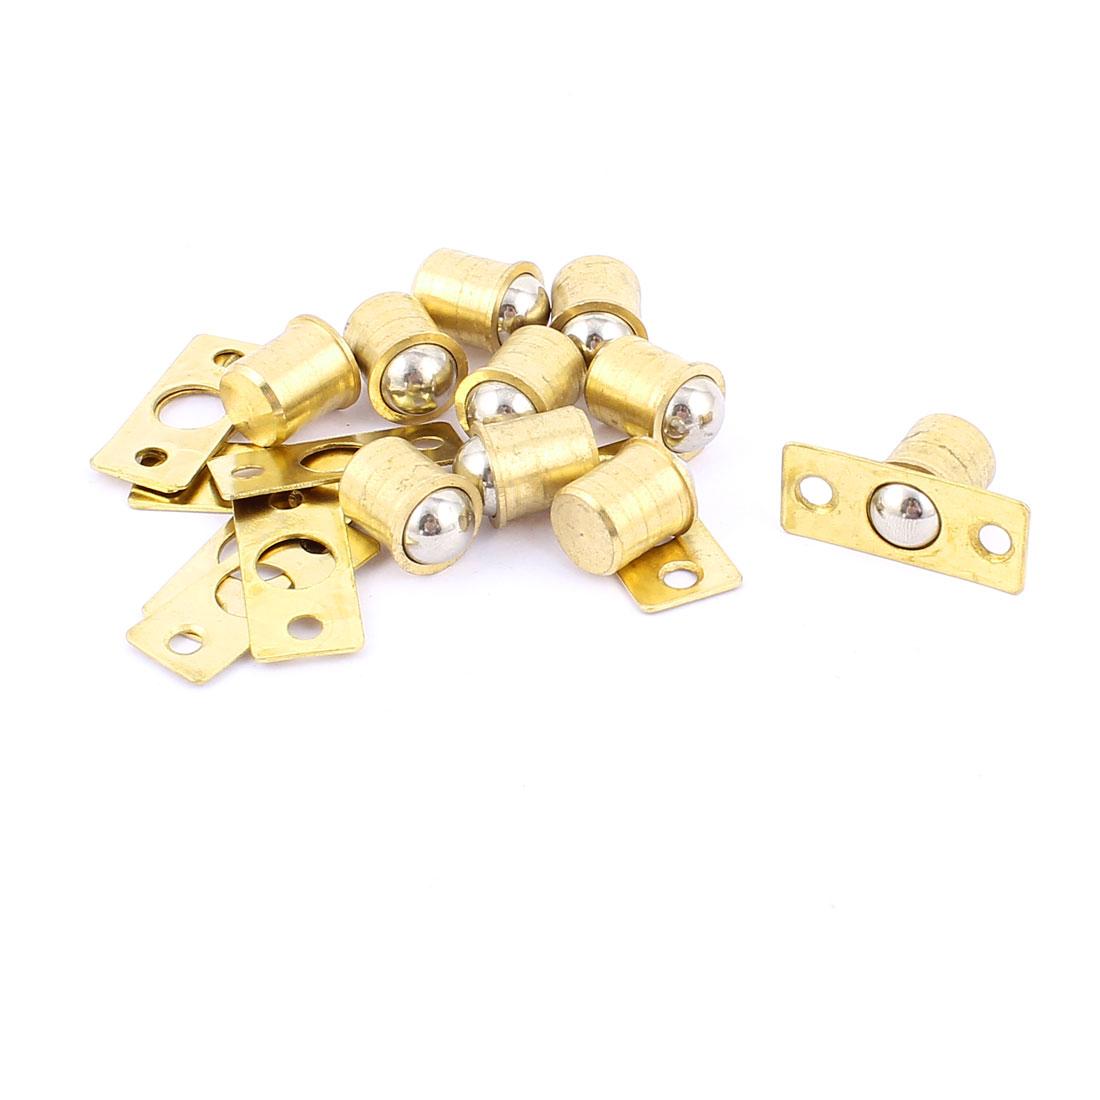 Closet Door 18mm x 14mm Ball Catch Latch Hardware Brass Tone 10pcs